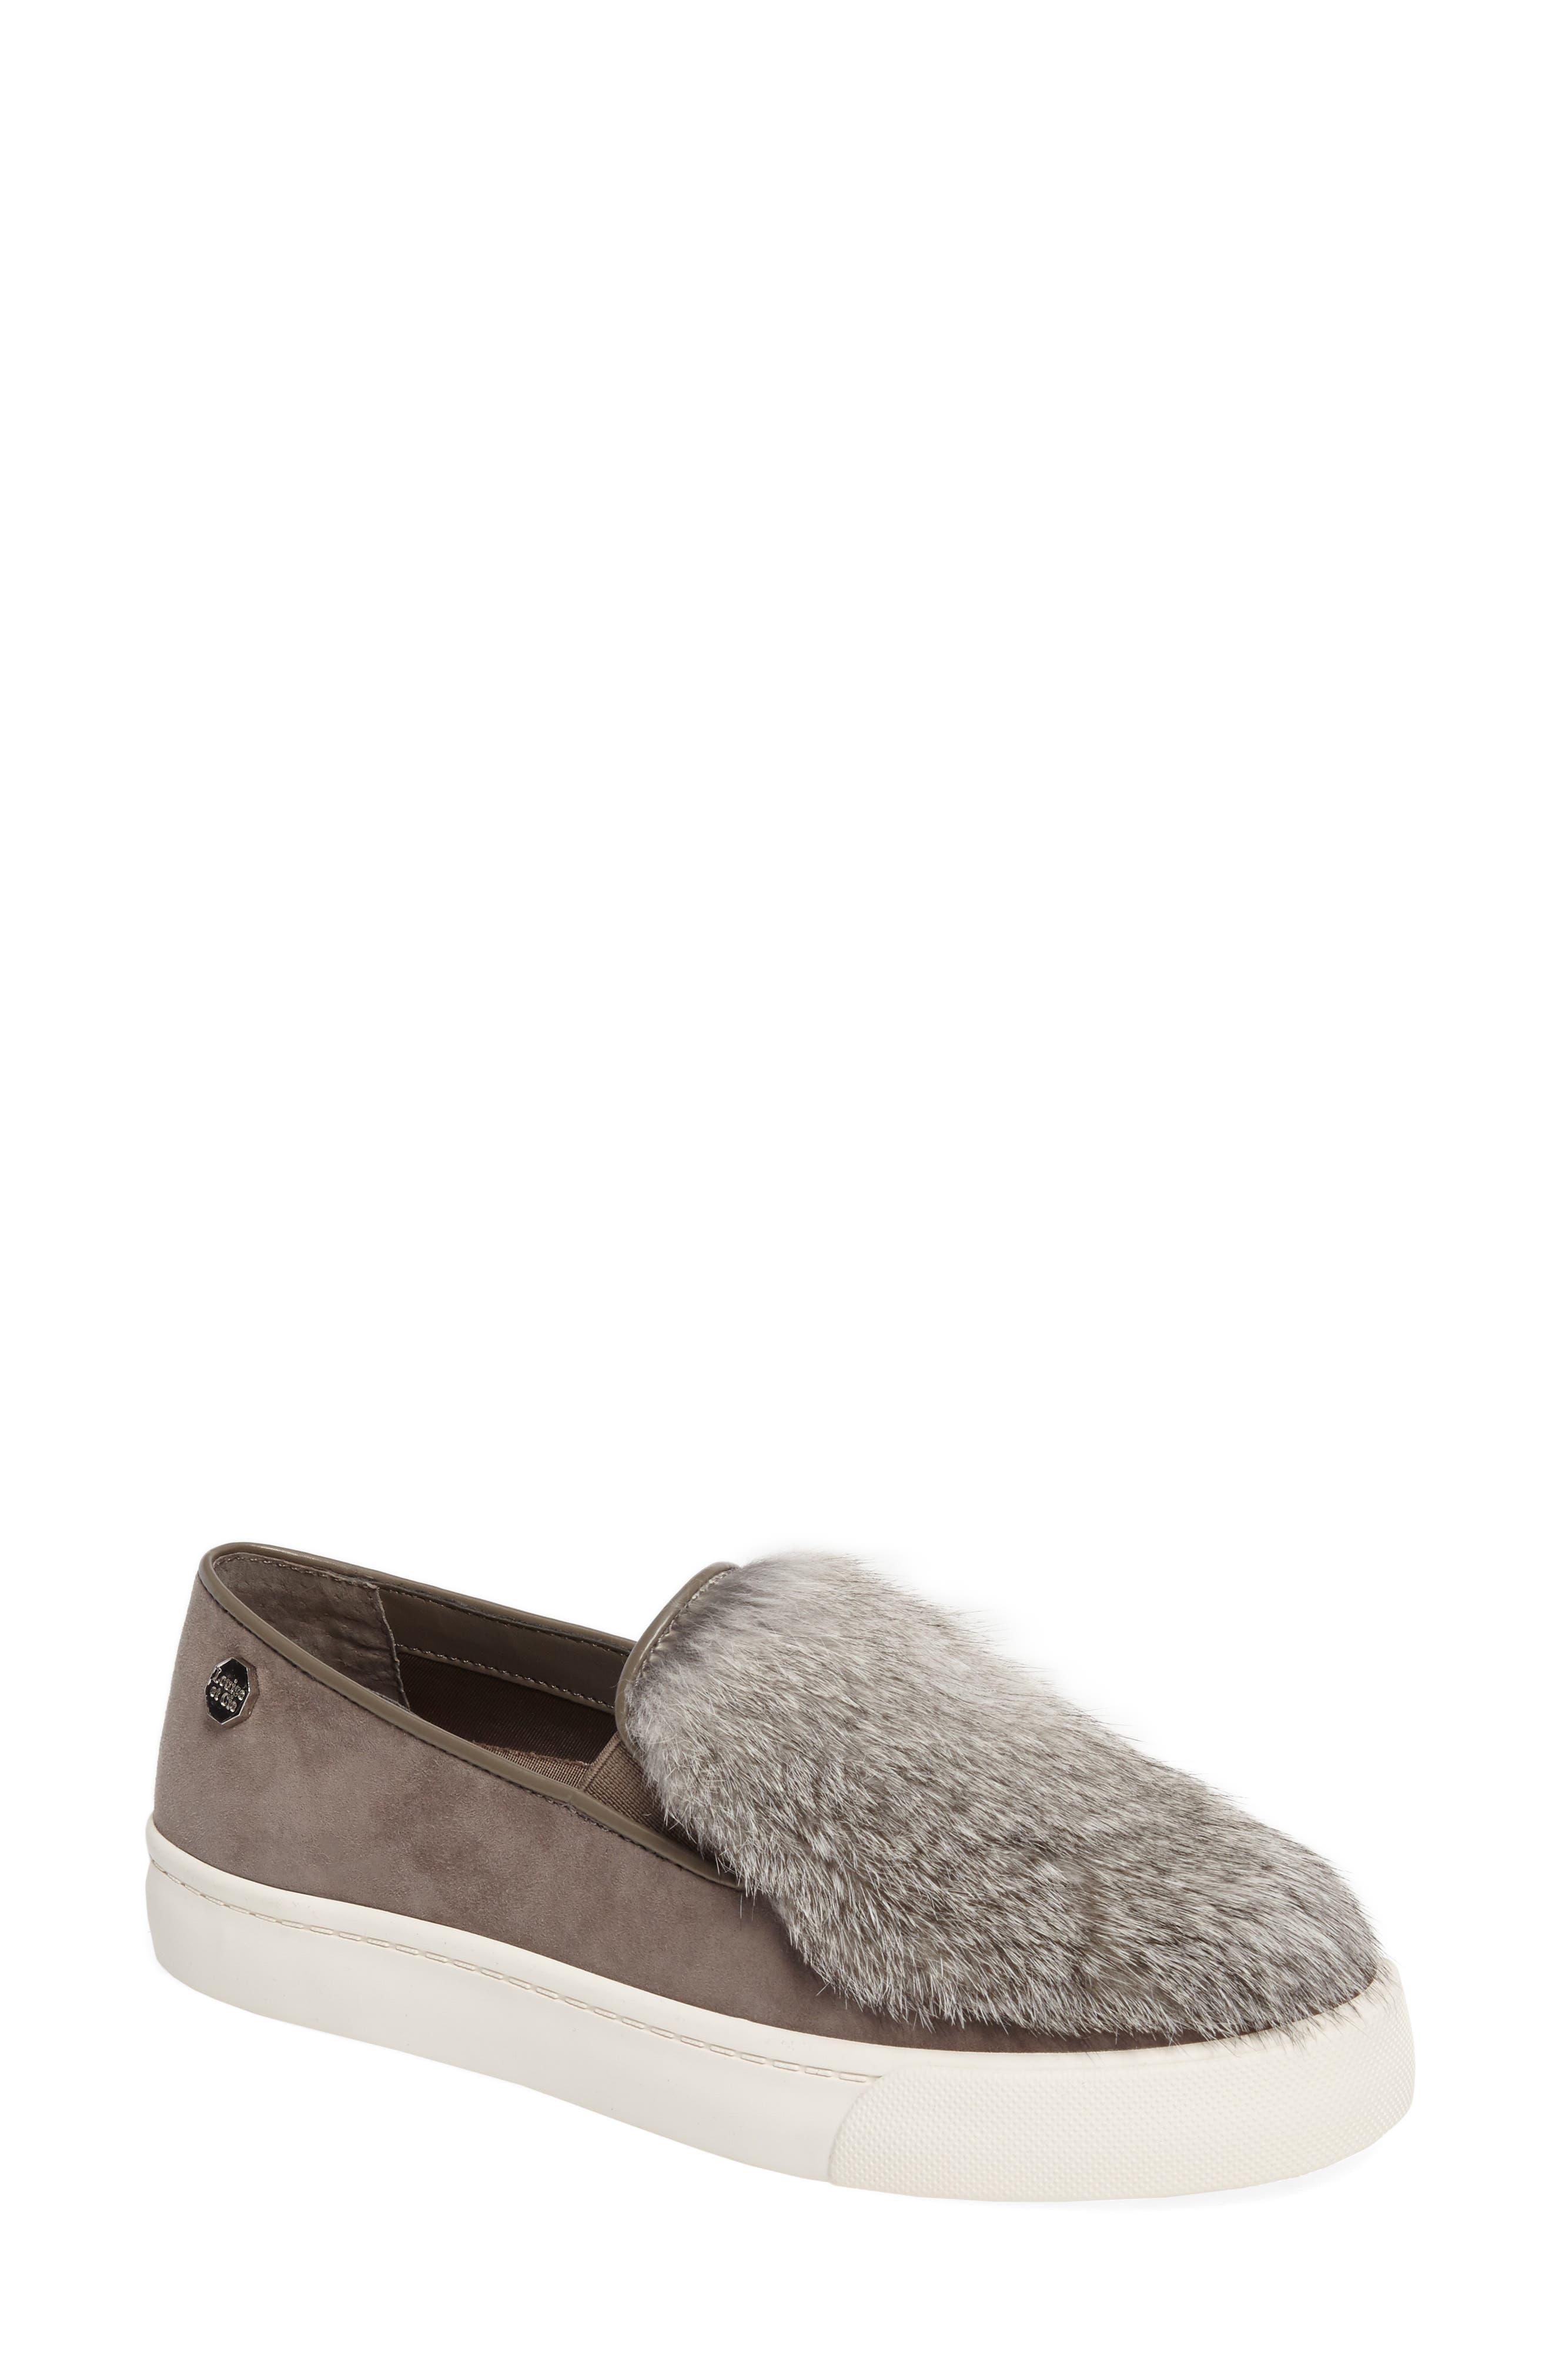 Main Image - Louise et Cie Bershner Genuine Rabbit Fur Slip-On Sneaker (Women)